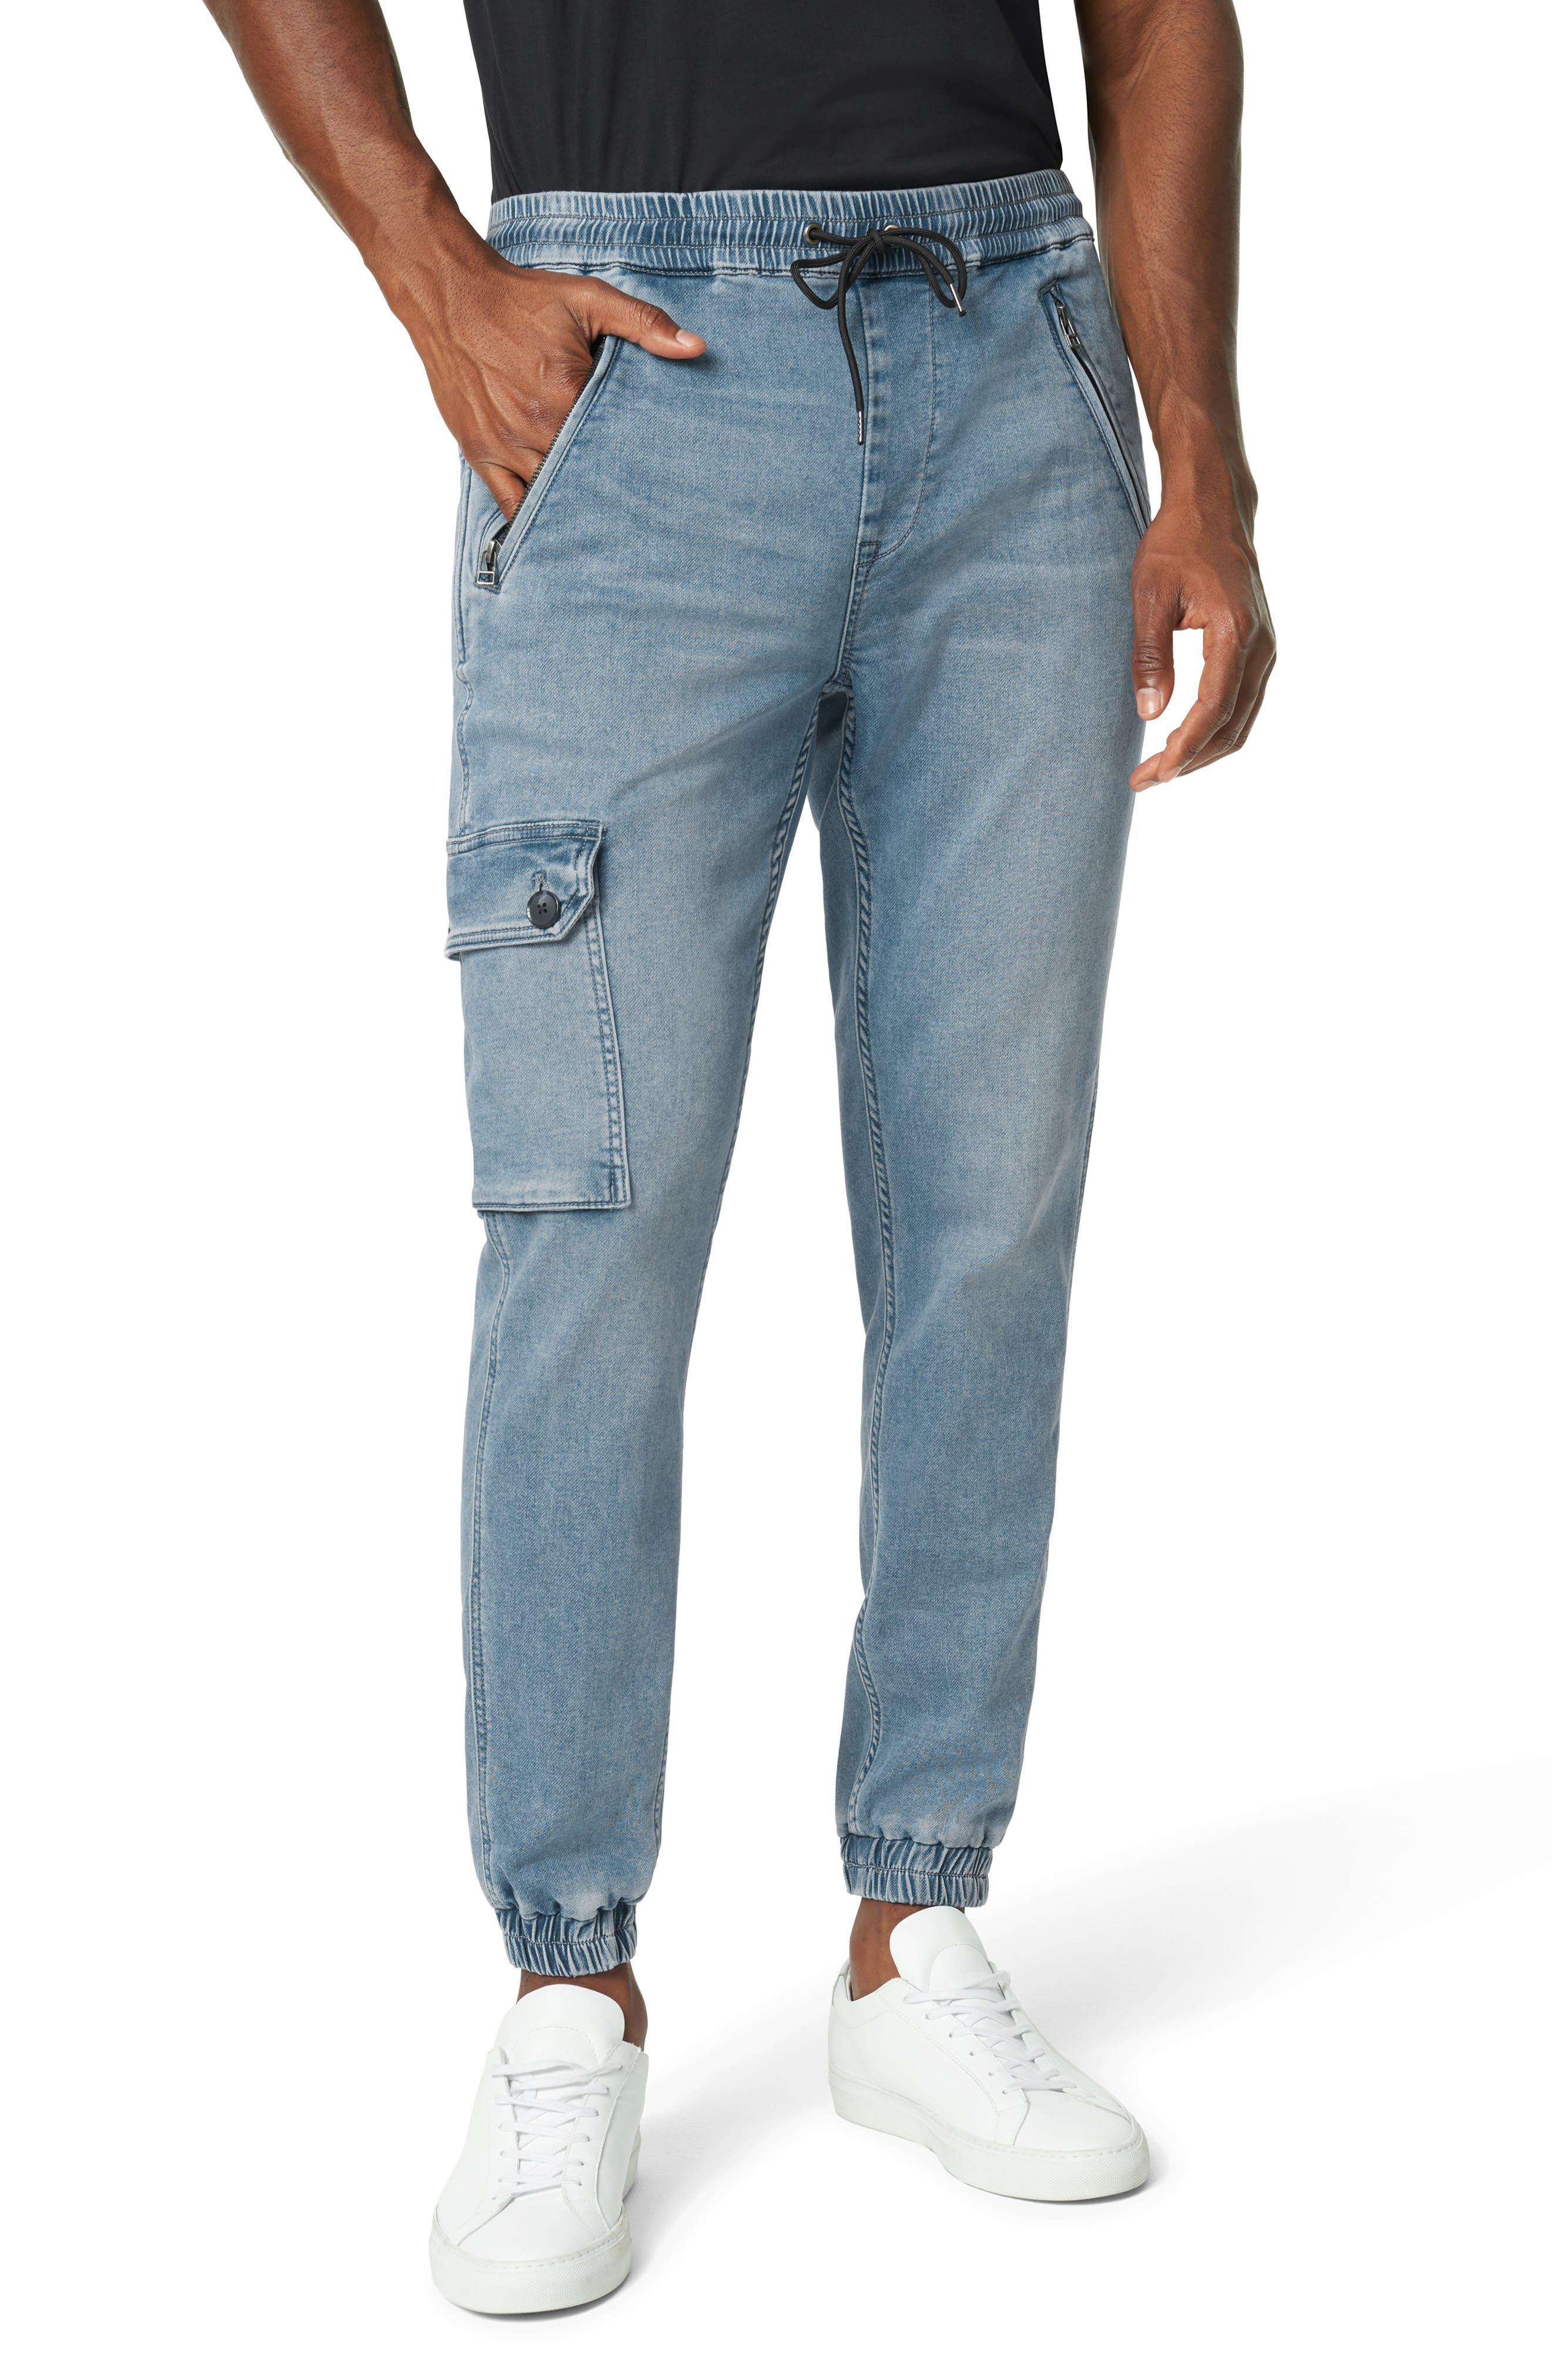 Men's Vintage Pants, Trousers, Jeans, Overalls Mens Joes Slim Fit Drop Yoke Cargo Jogger Jeans $111.00 AT vintagedancer.com